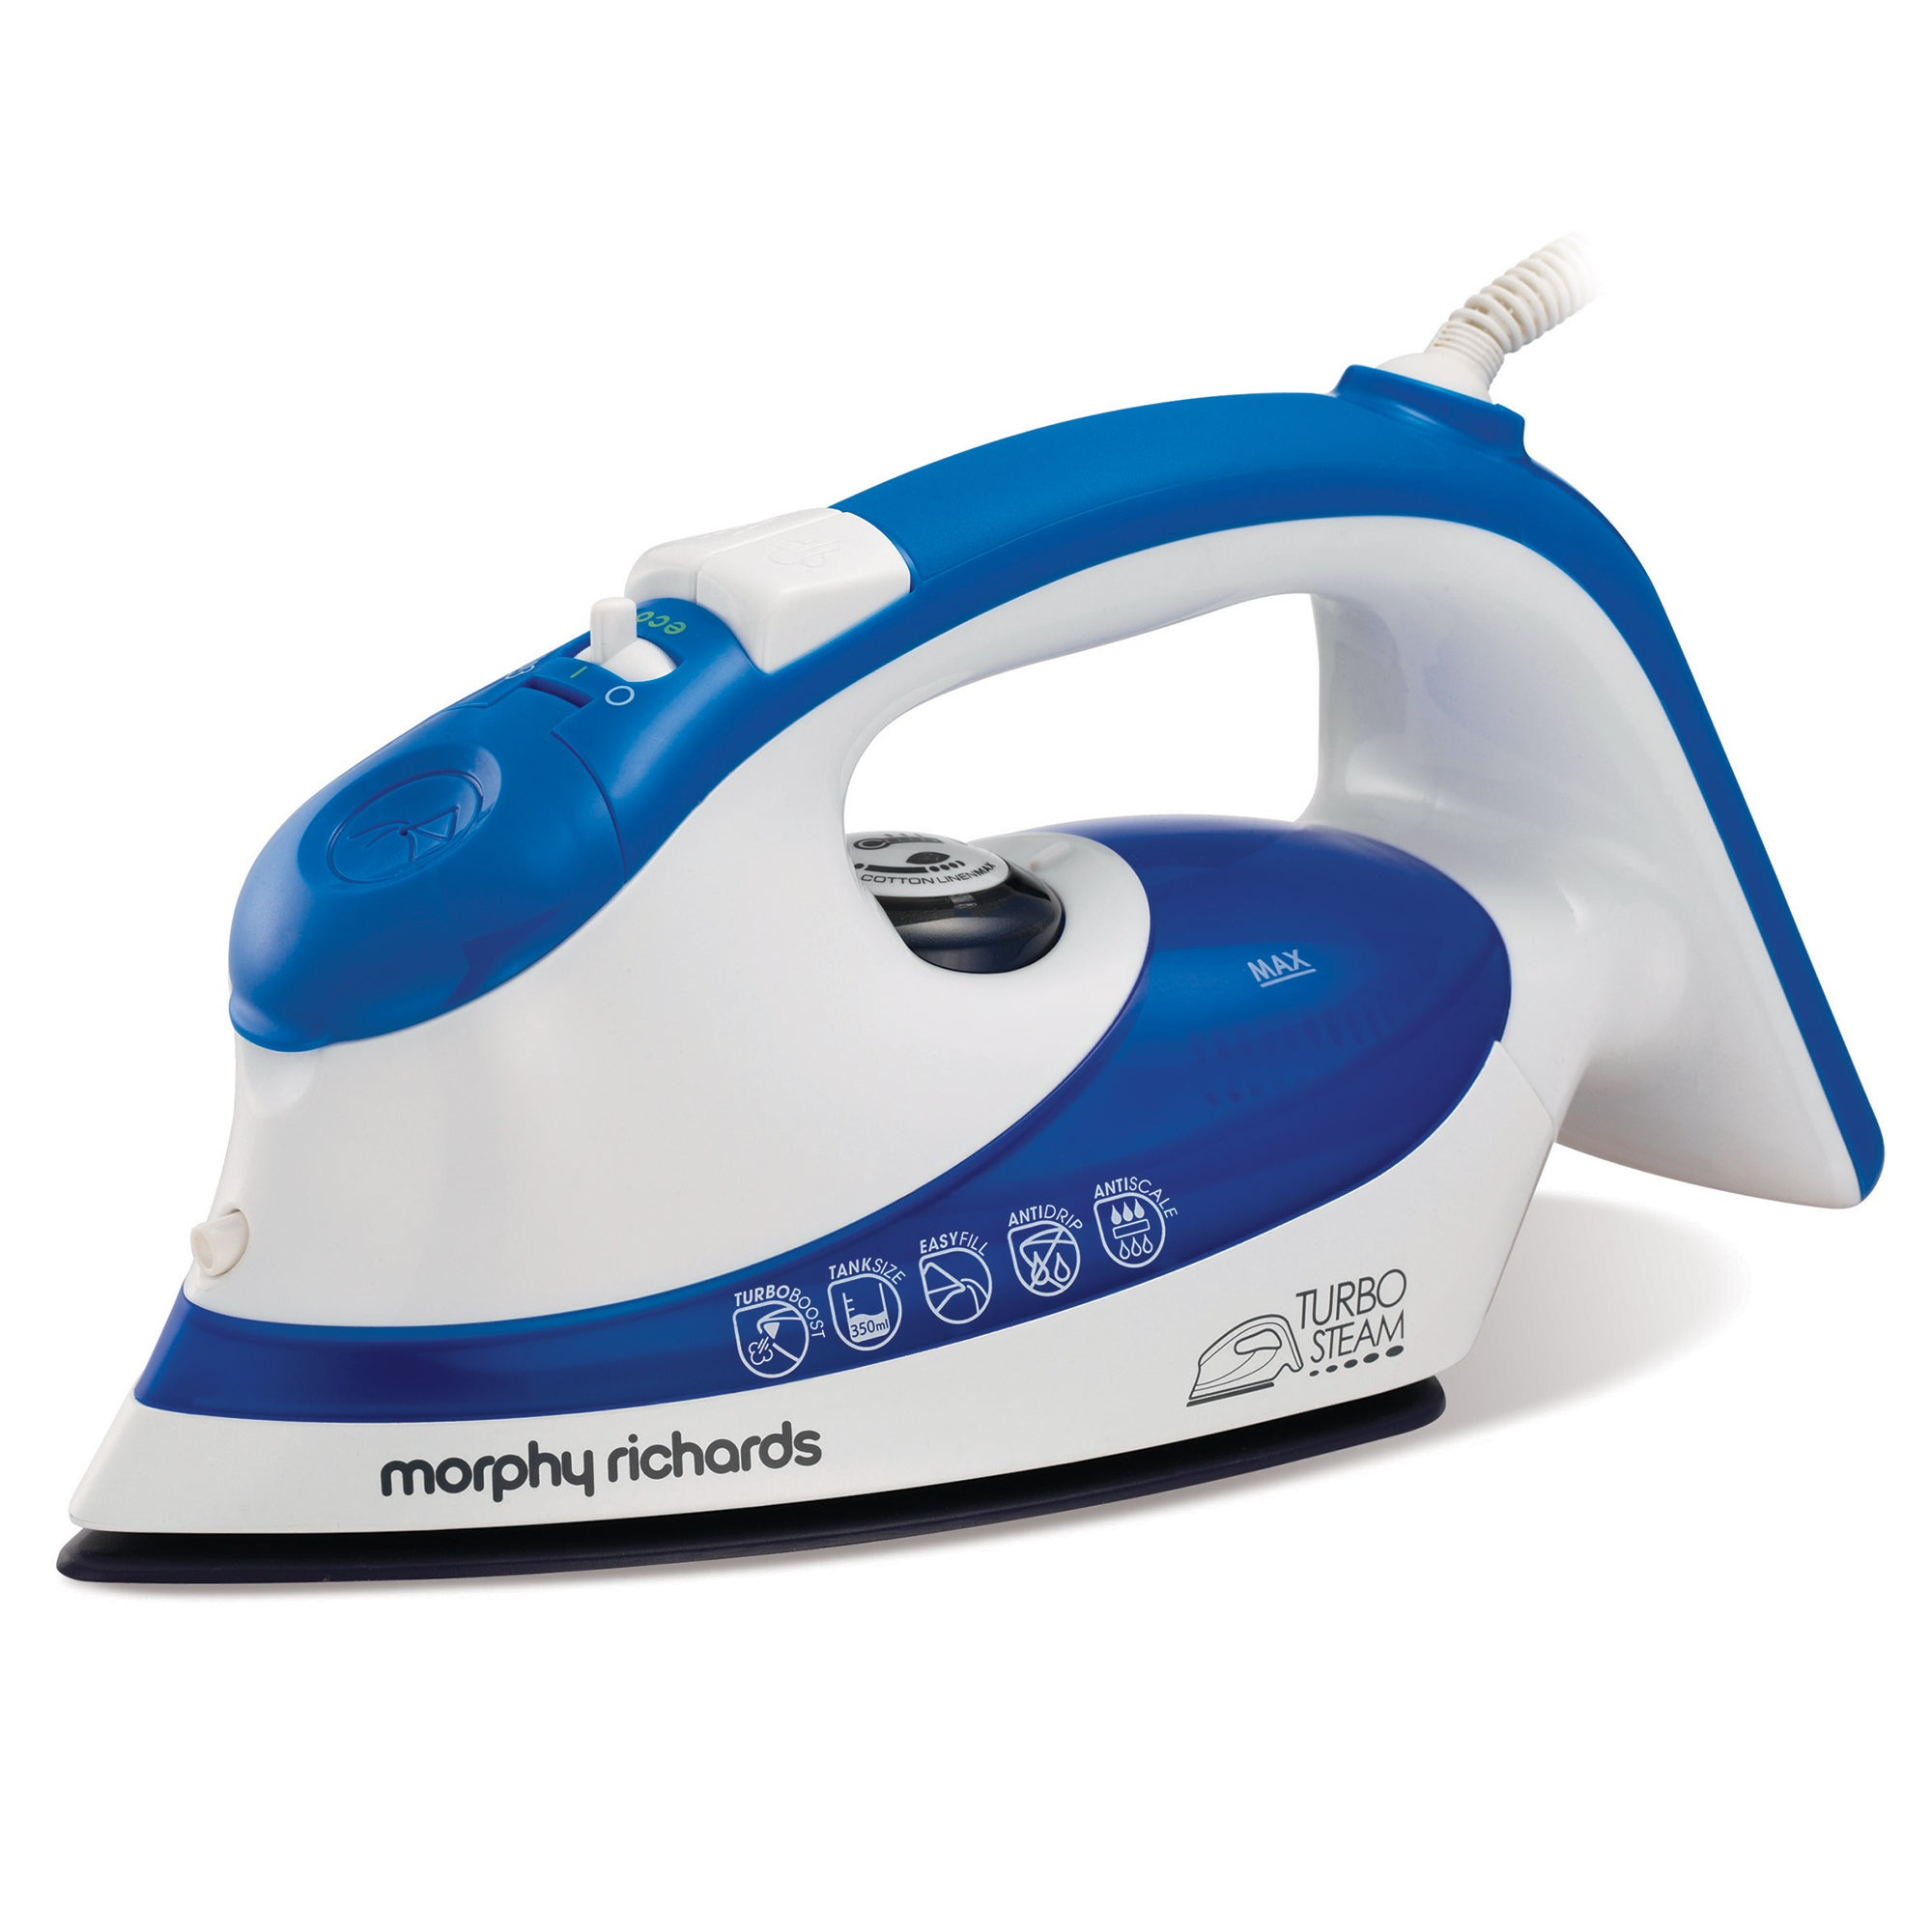 Morphy Richards 300603 Blue Ionic Turbosteam Iron